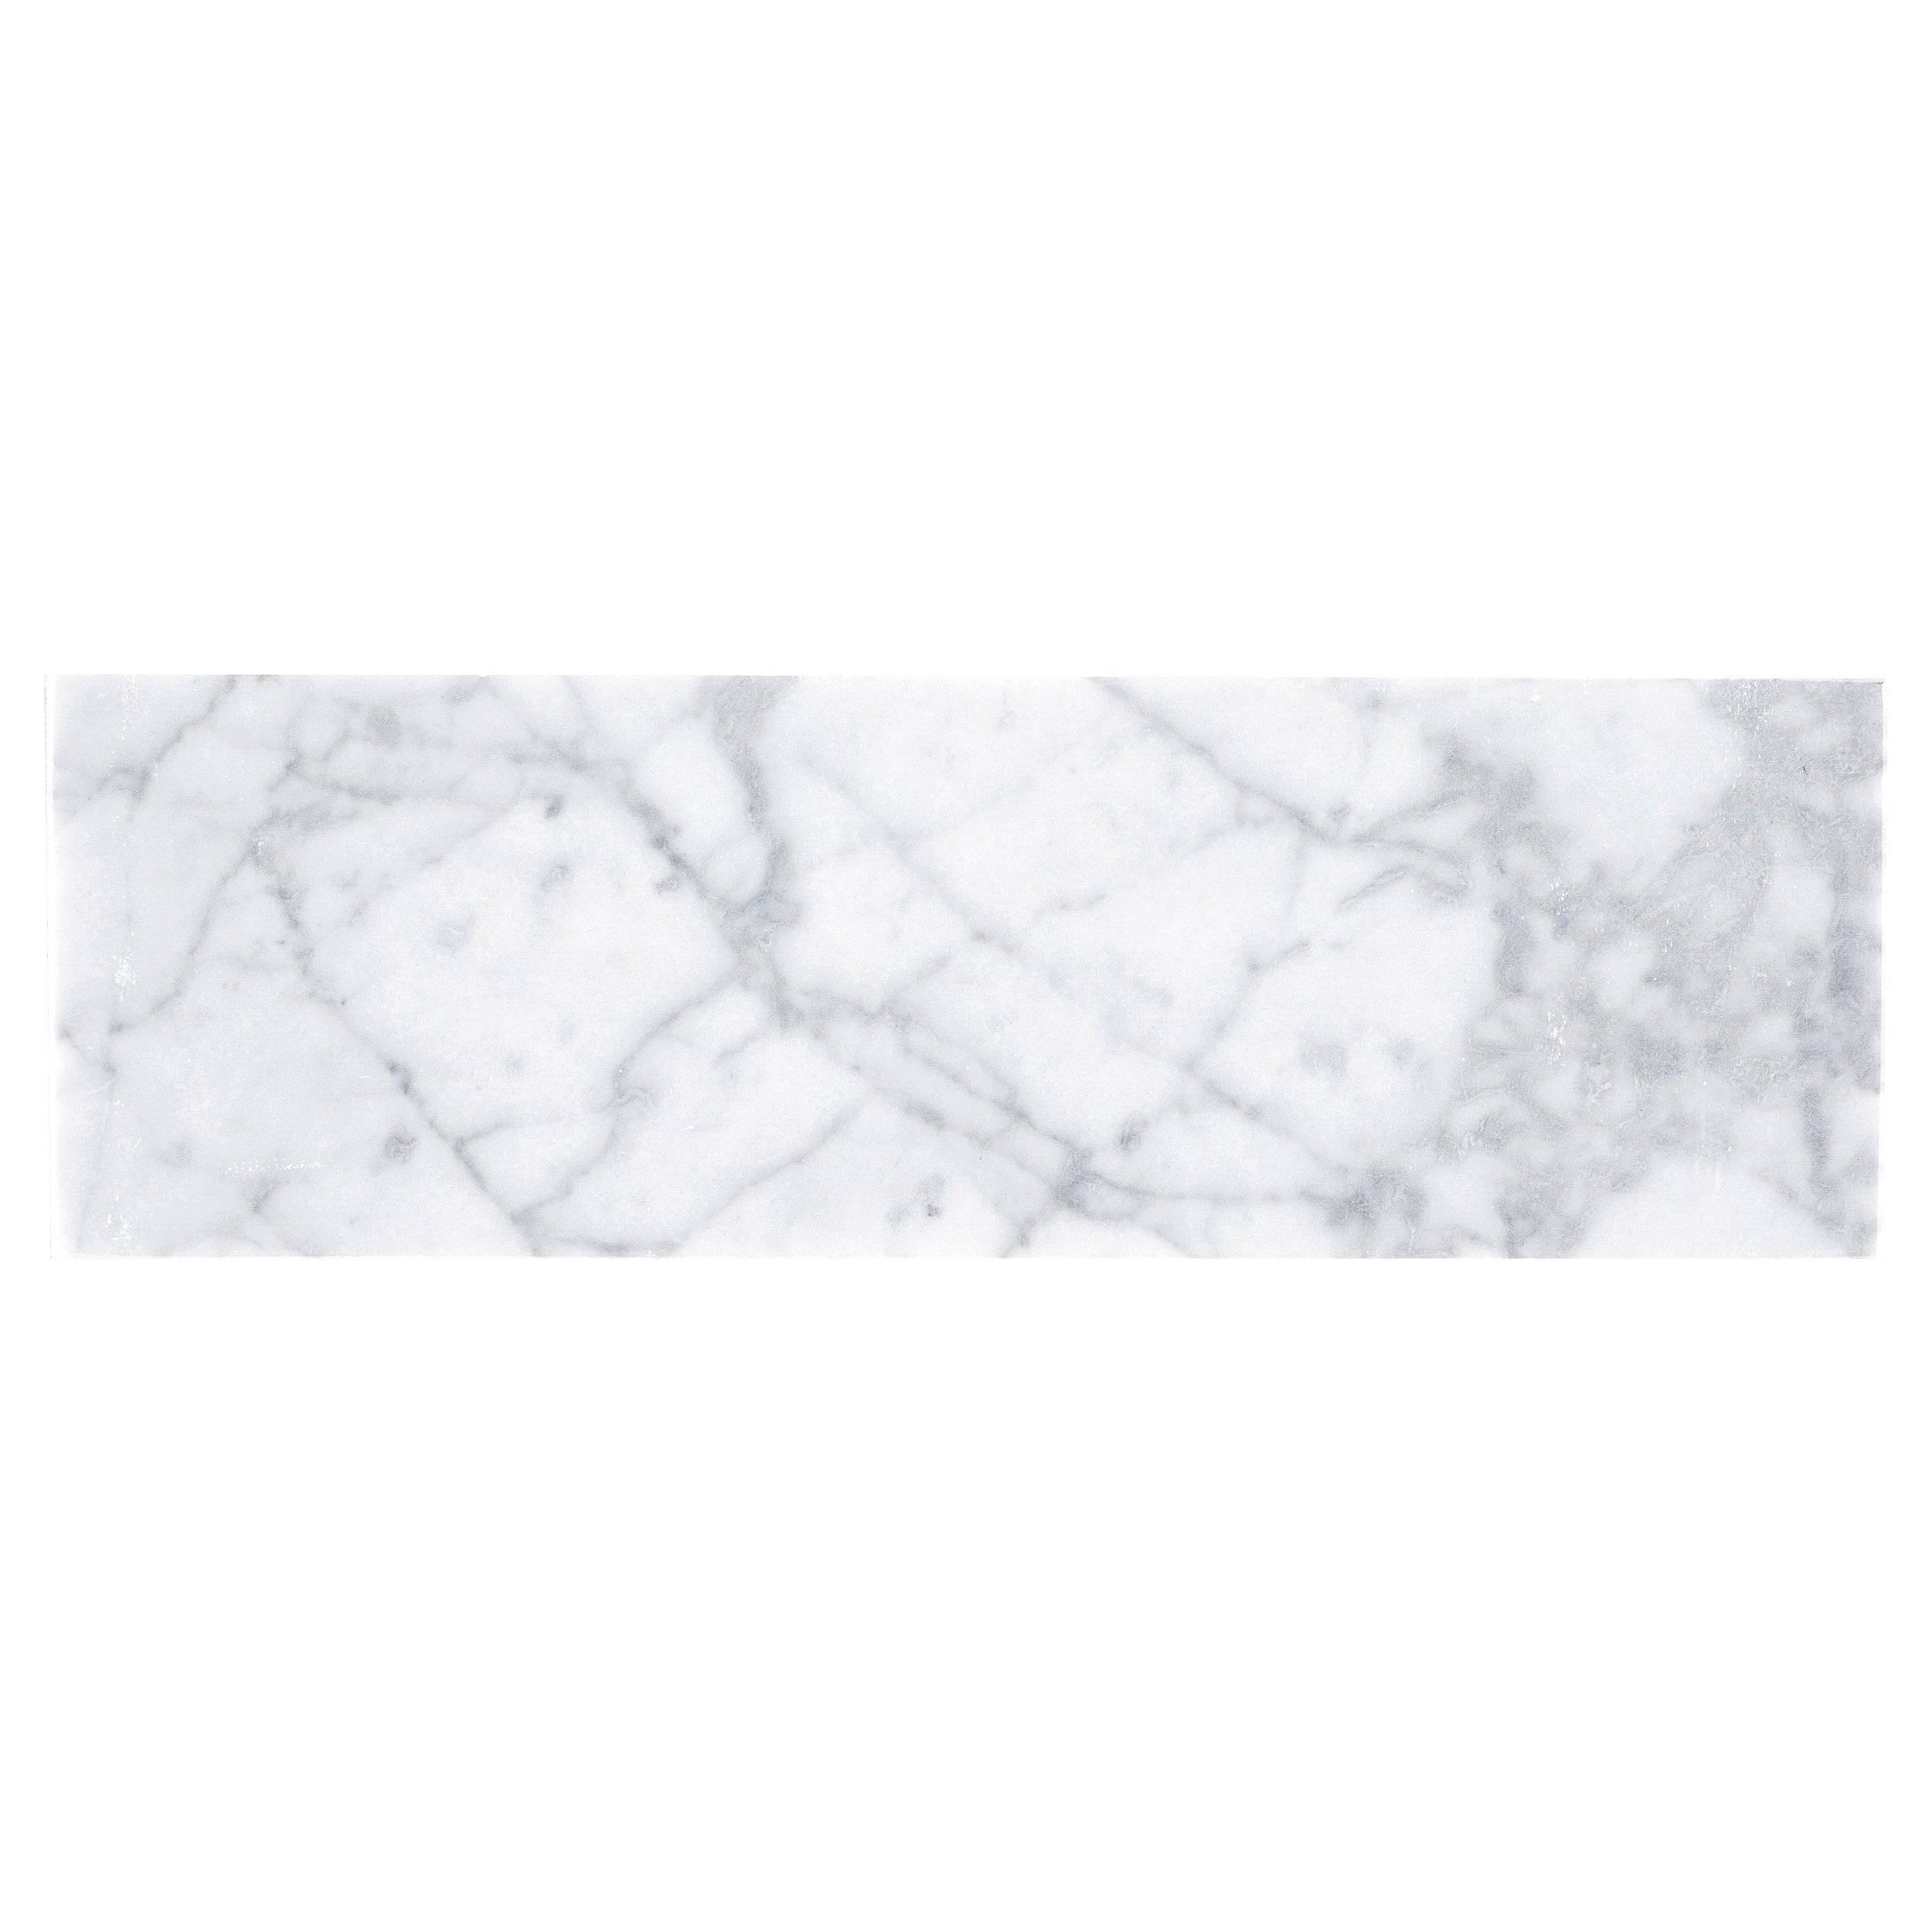 Bianco Carrara Polished Marble Tile 3 X 6 931100477 Floor And Decor